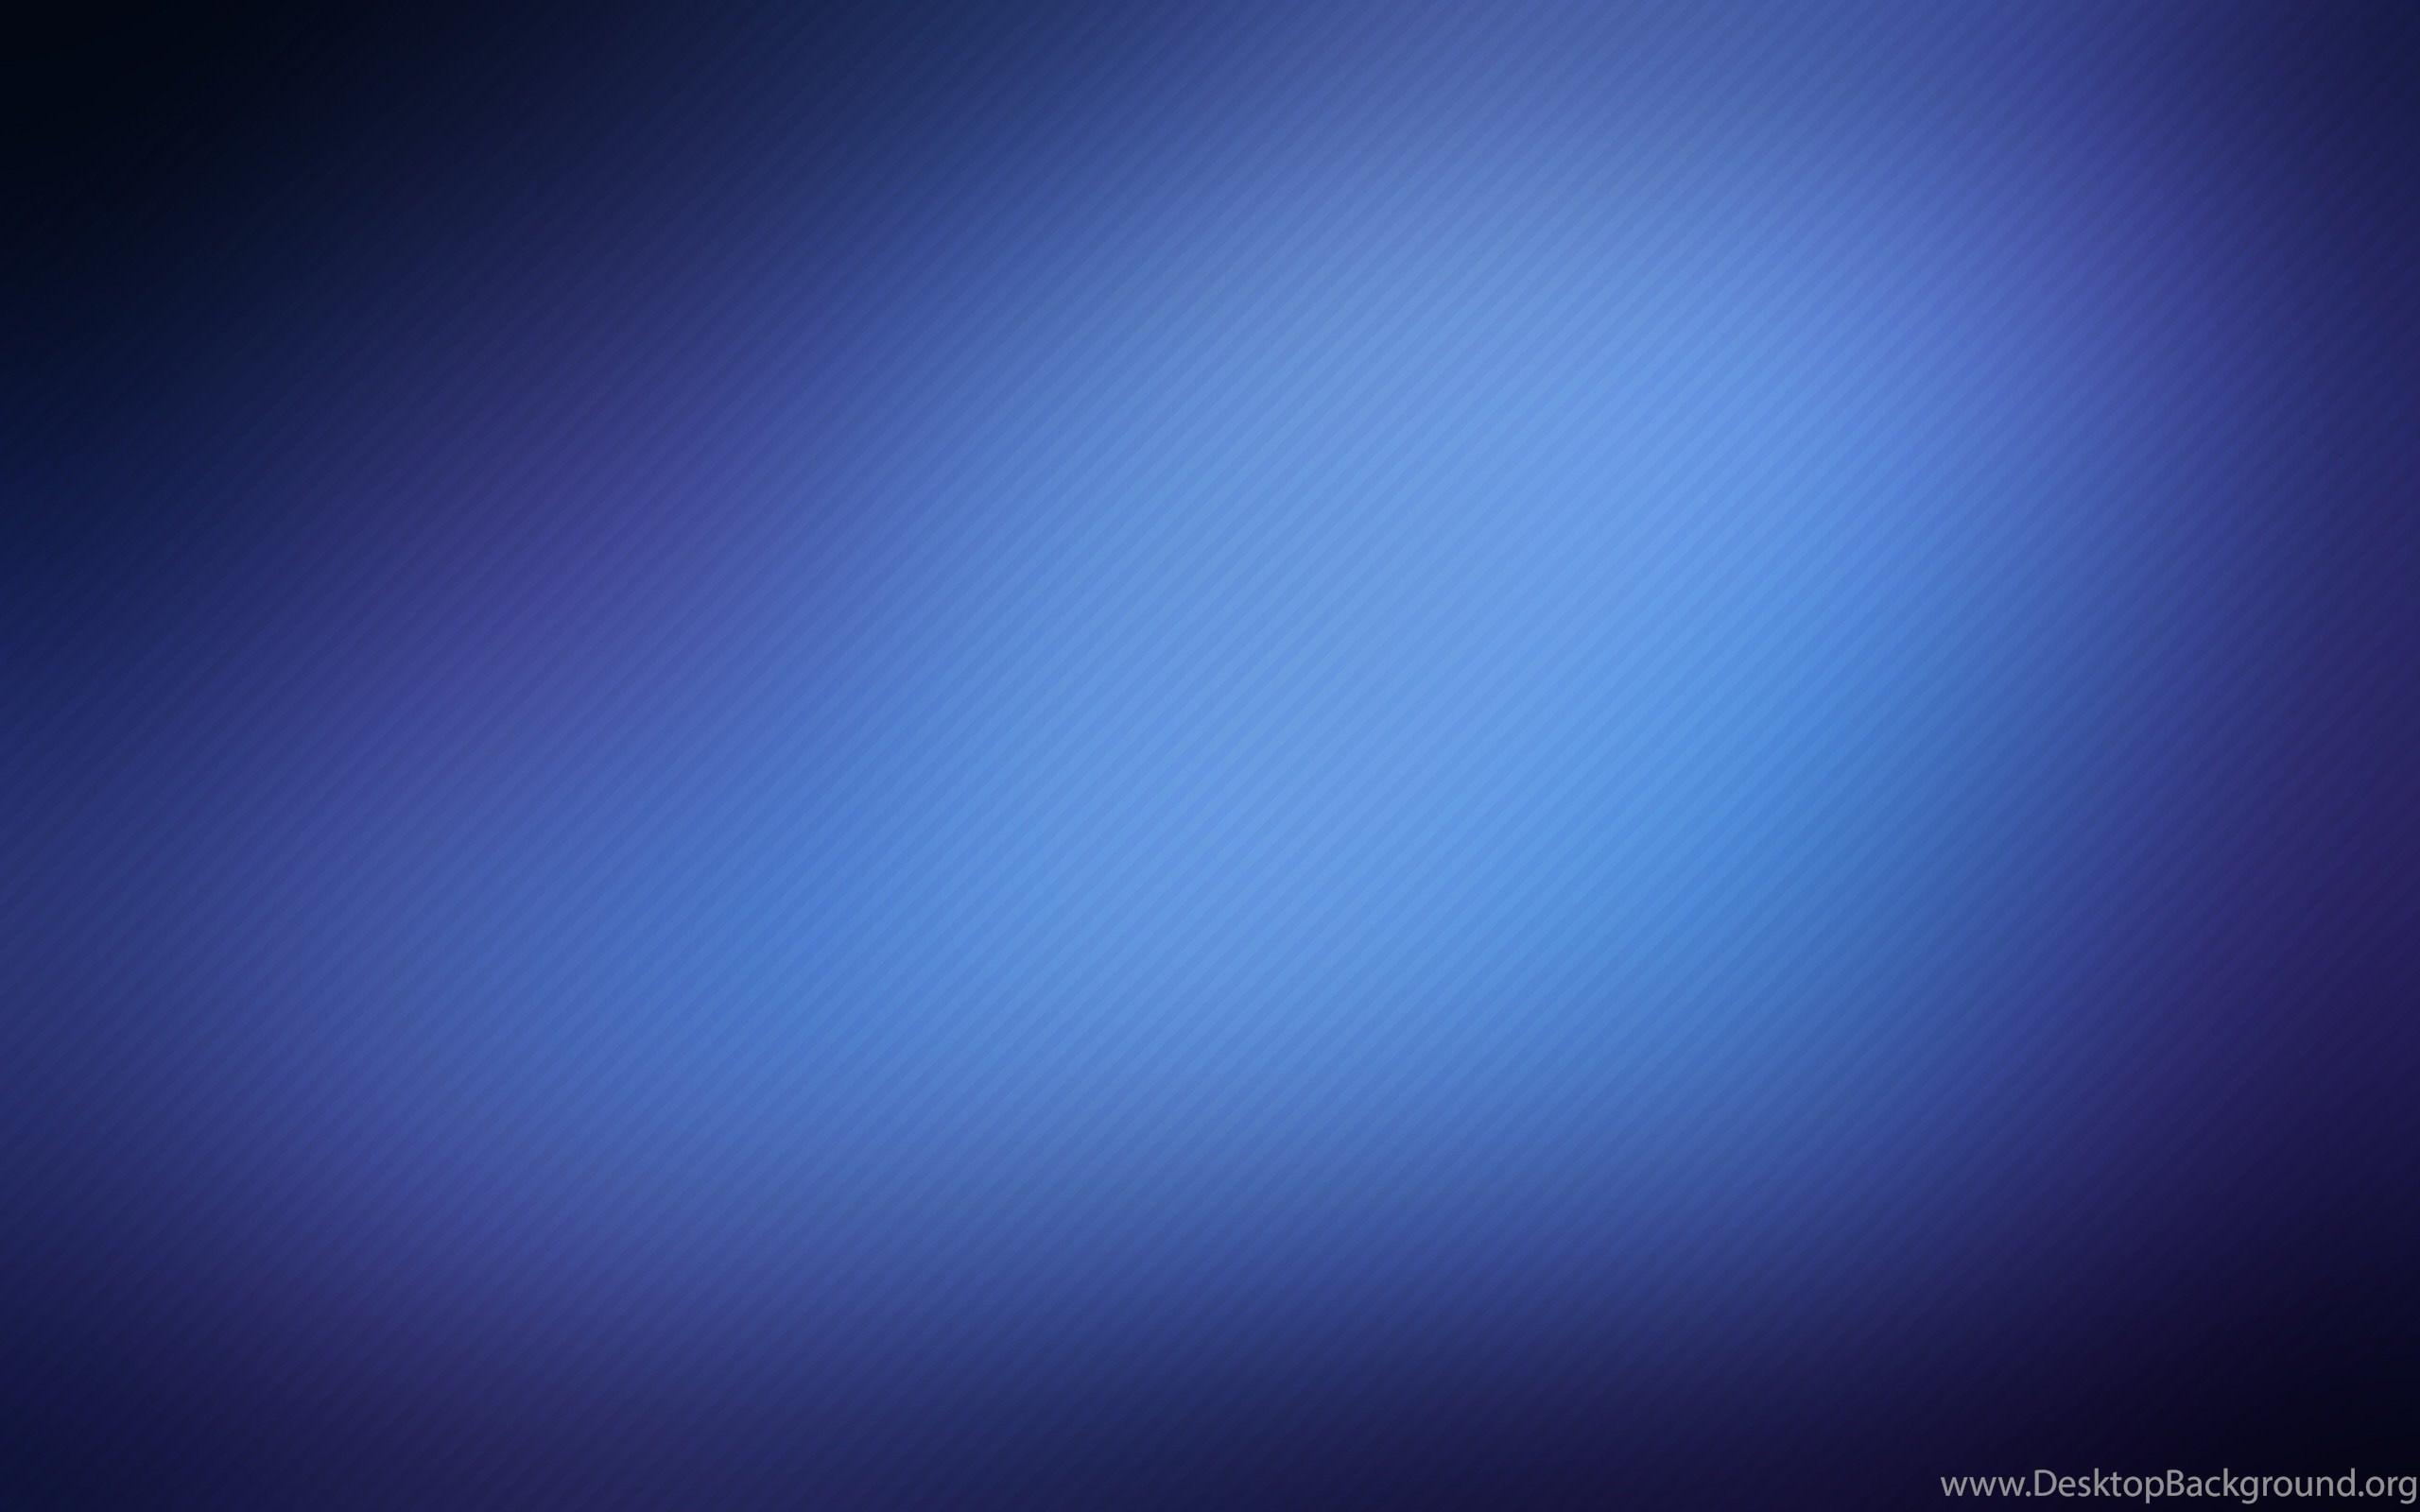 Hd Desktop Backgrounds 1680x1050: Plain Backgrounds Wallpapers HD Free 396354 Desktop Background